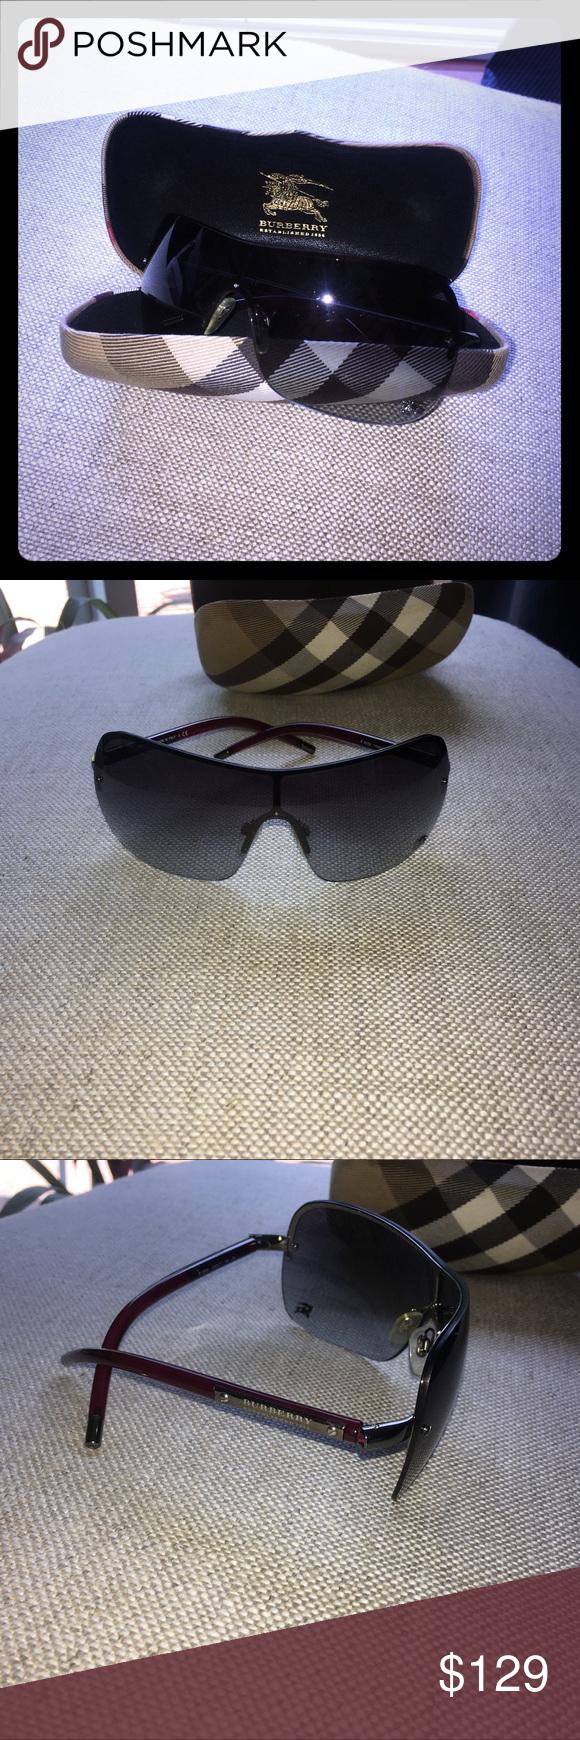 71d39351f347 Burberry unisex sunglasses In perfect condition Burberry Accessories  Sunglasses